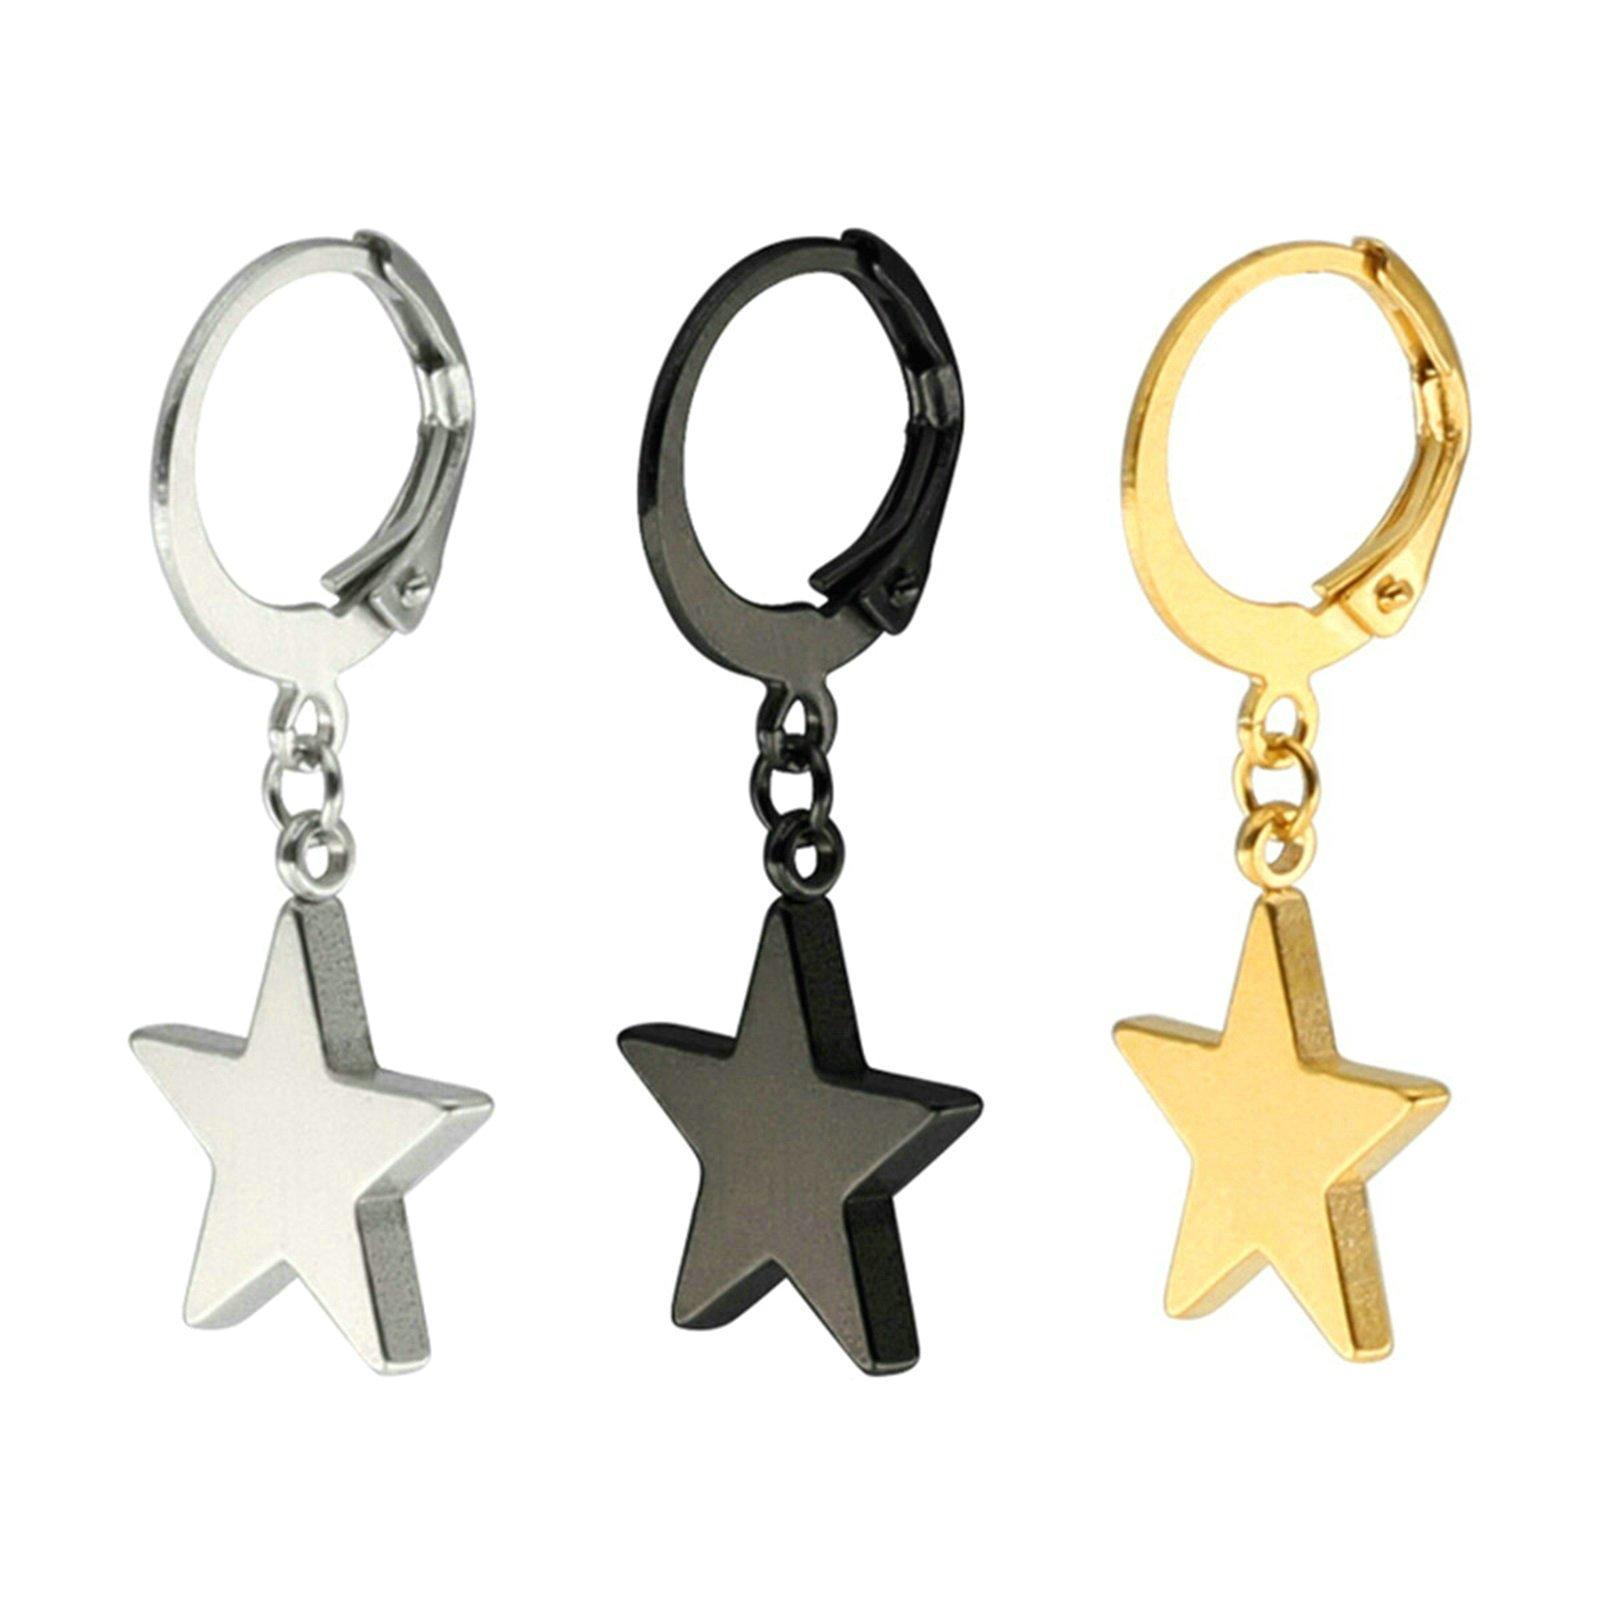 Aooaz, 3Pcs Stainless Steeel Star Hoop Earrings Teens Dangling Earrings Teens Sets for Men Women 13MM